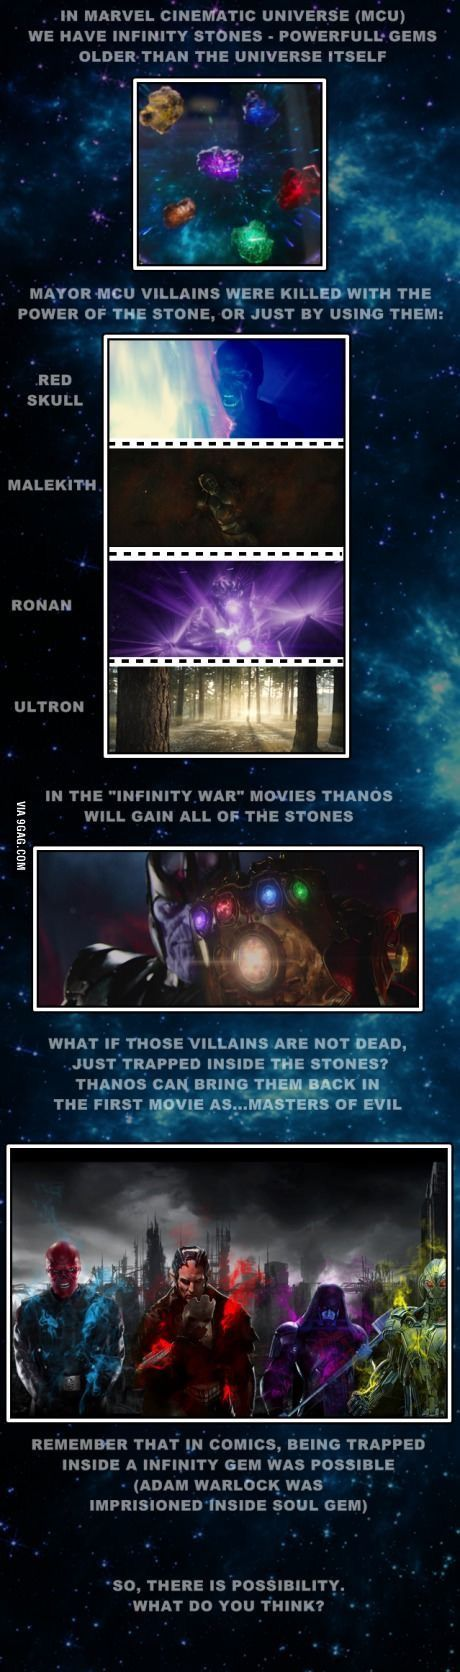 MCU Infinity Stone Conspiracy